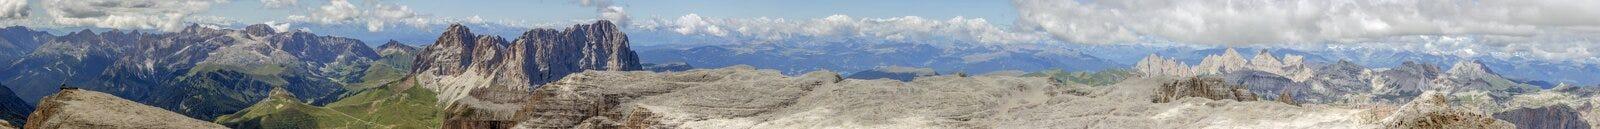 Sella从Piz Boe的山全景 免版税图库摄影